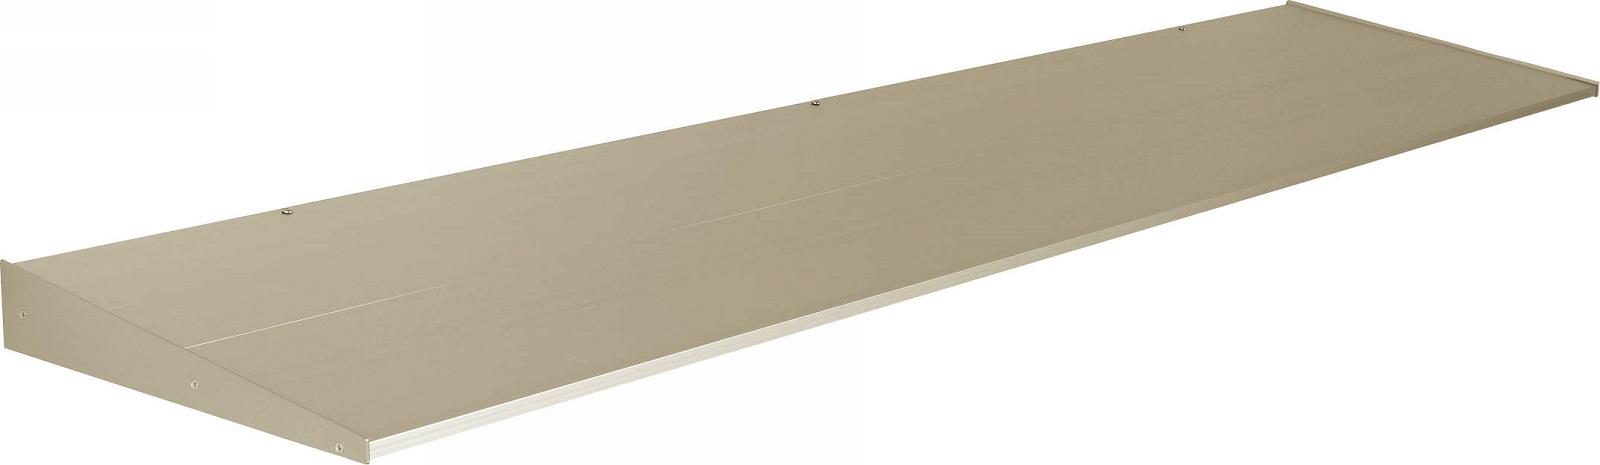 YKKAP窓まわり ひさし コンバイザー モダンスタイル 出幅400mm:先付・後付兼用[幅1305mm×高60mm]